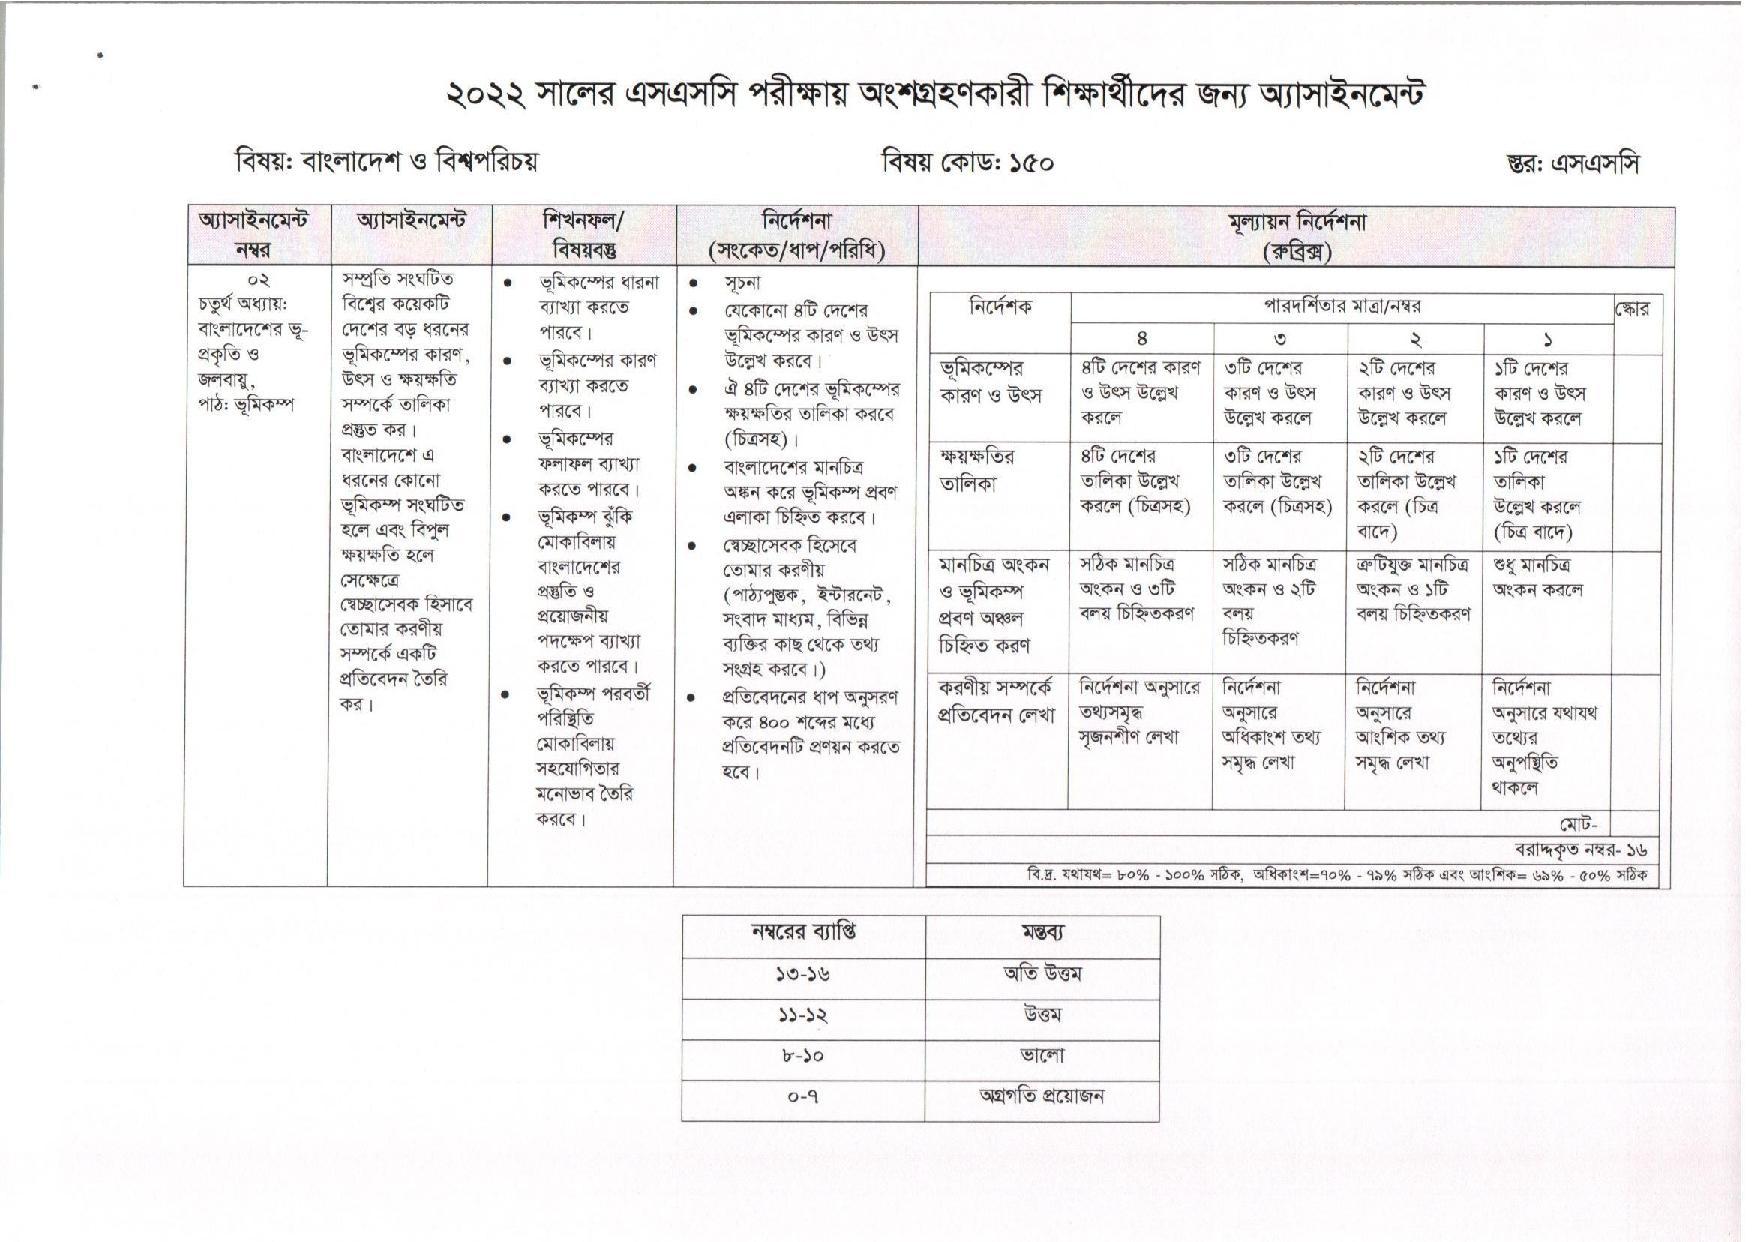 SSC BGS Assignment 5th Week